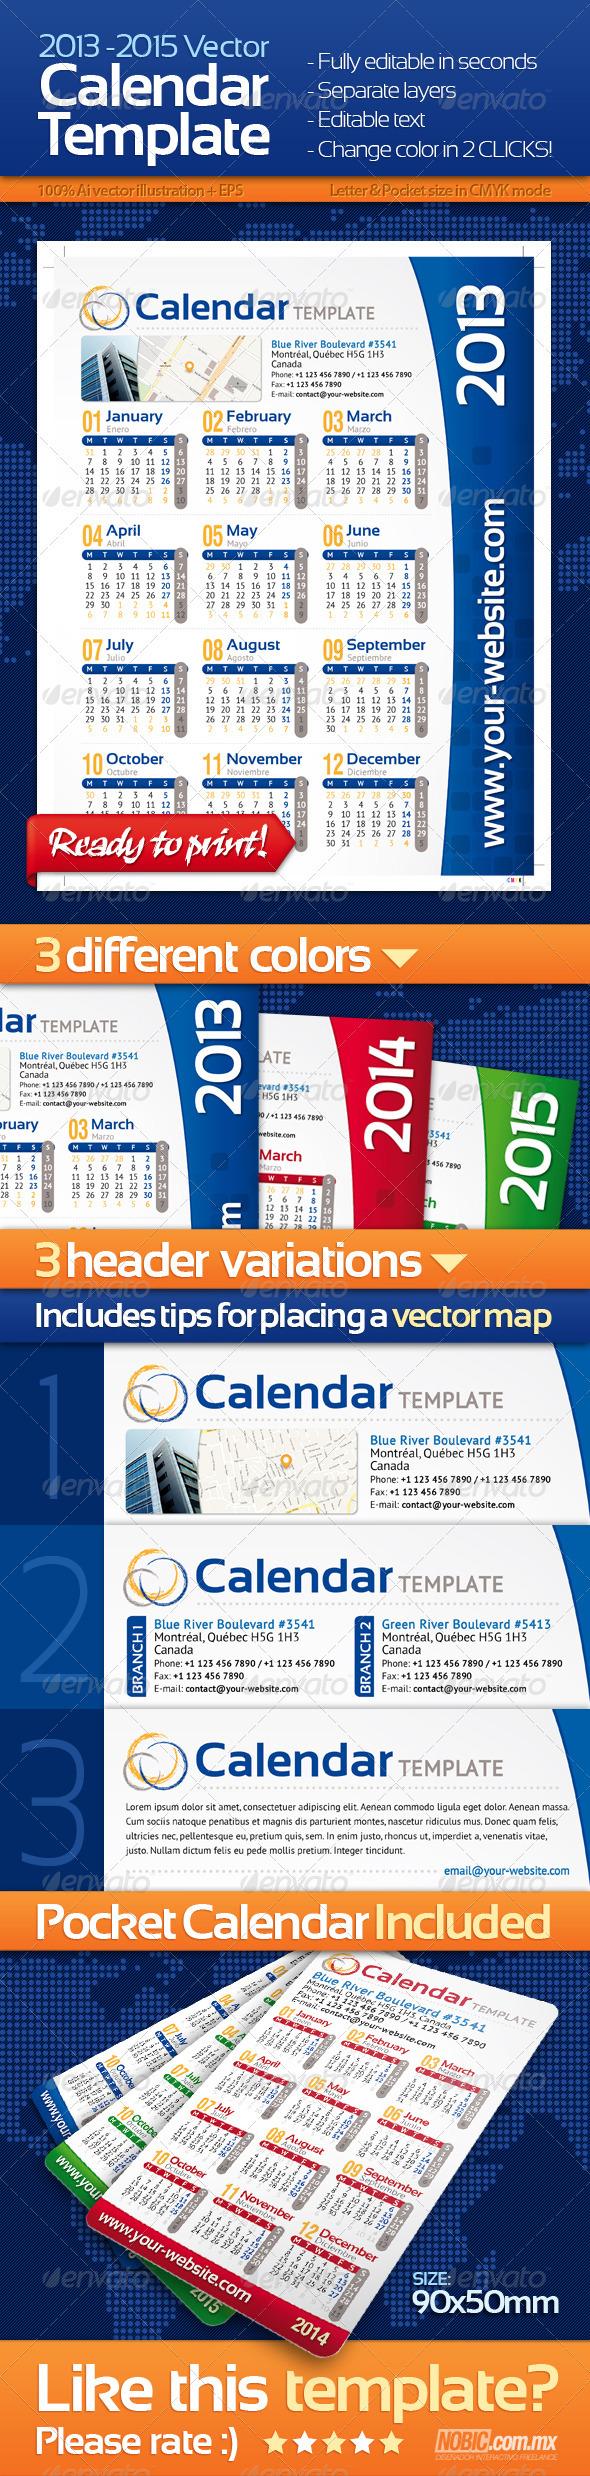 GraphicRiver 2013 2014 and 2015 Calendar Template 2879999